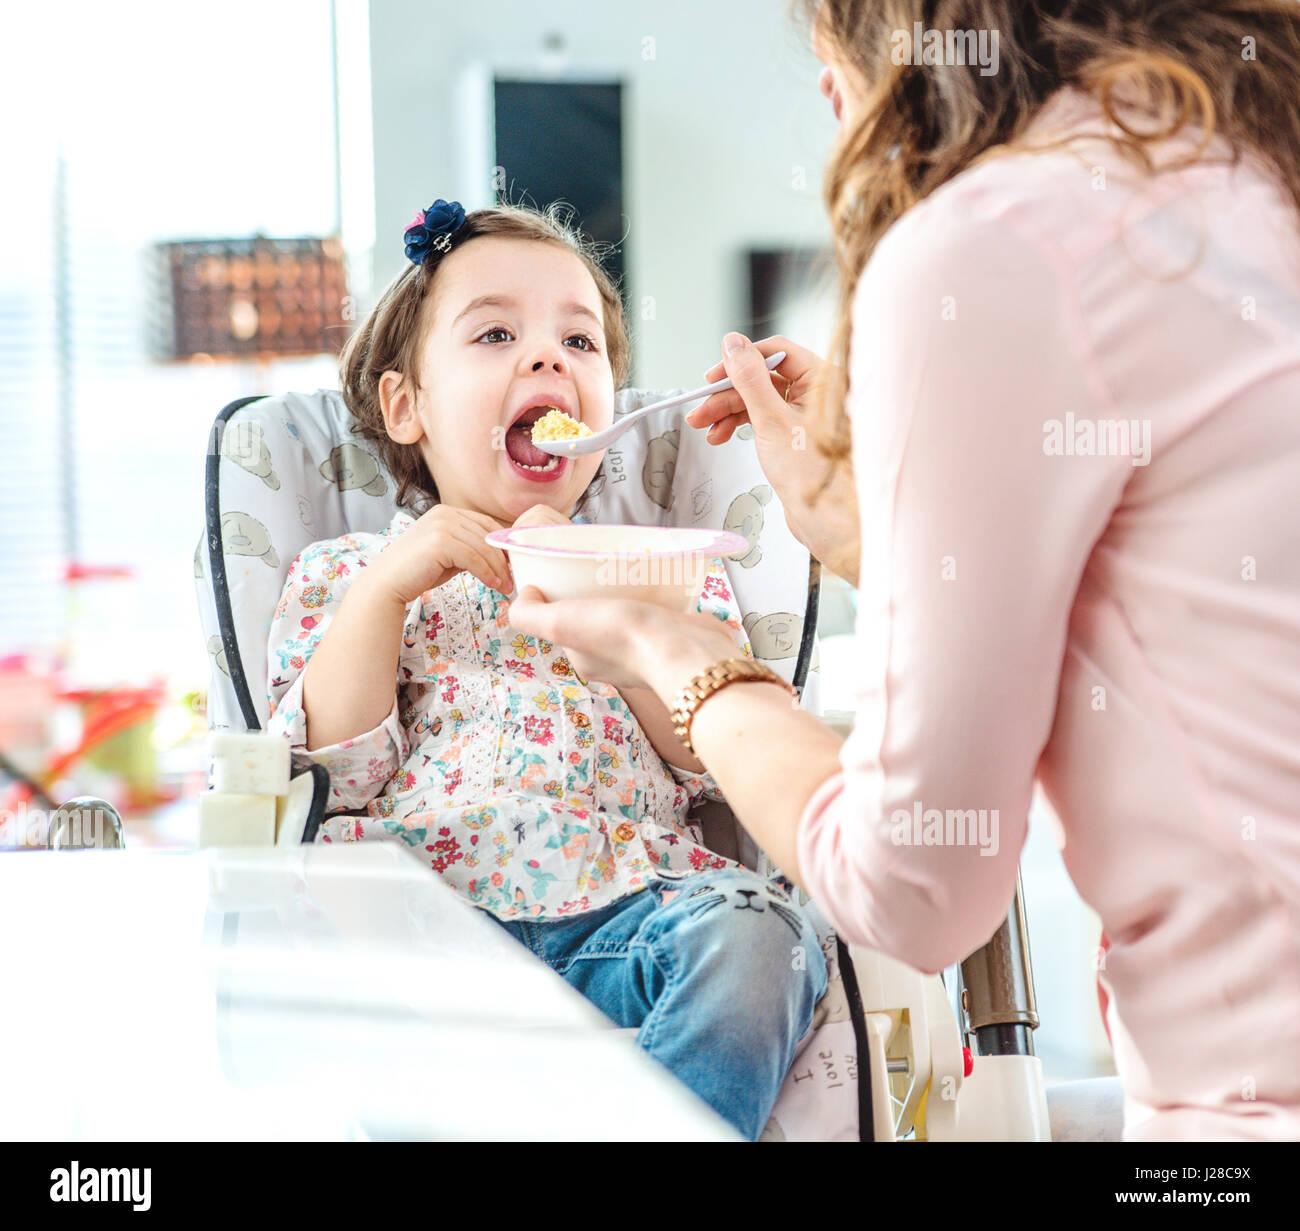 Mother feeding her beloved daughter - Stock Image